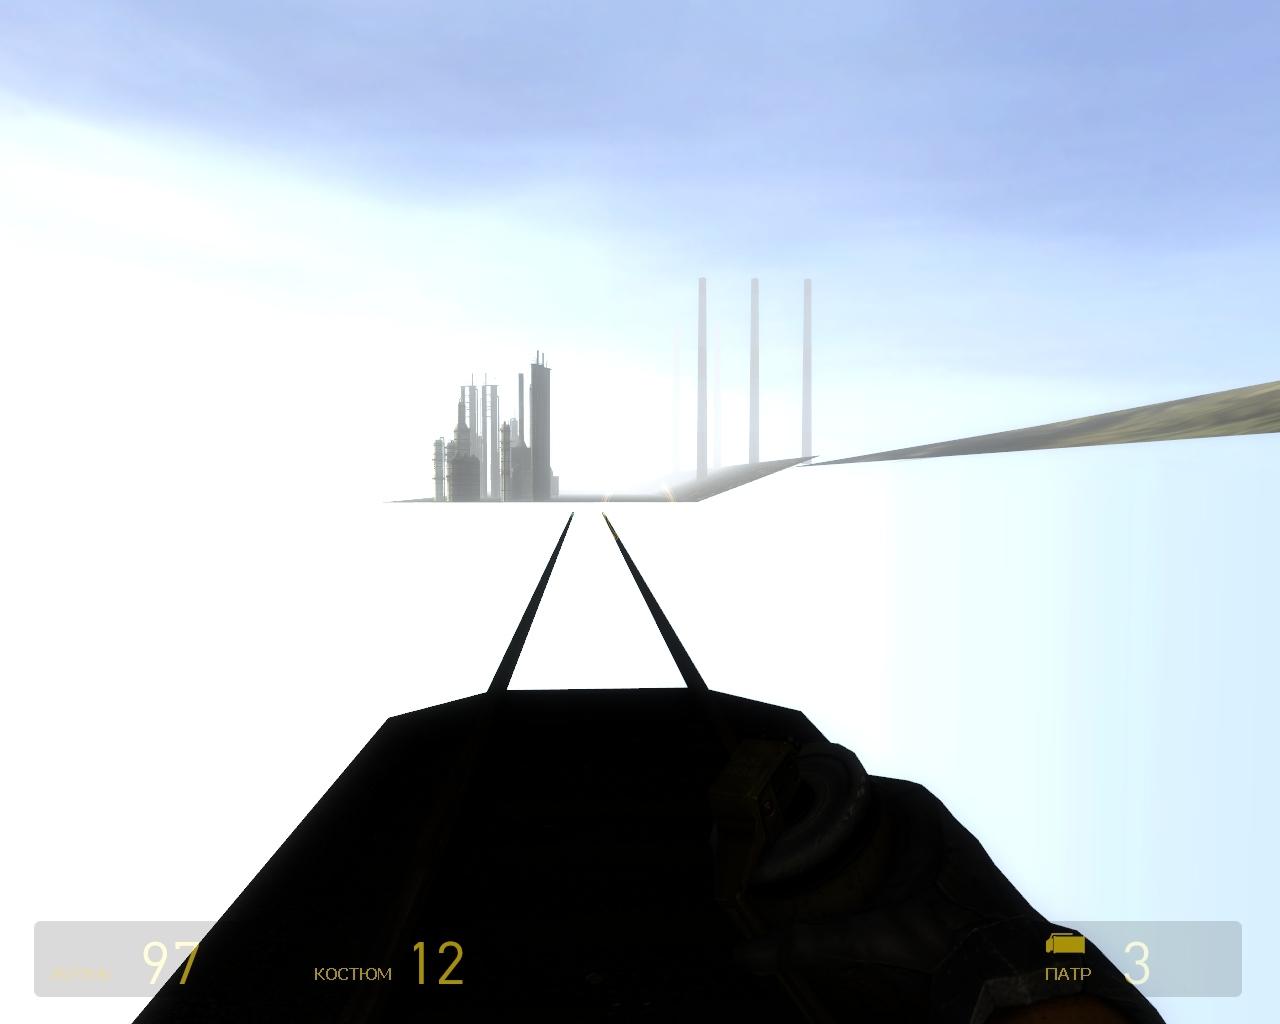 d1_town_050005.jpg - Half-Life 2 Half-Life 2: Update